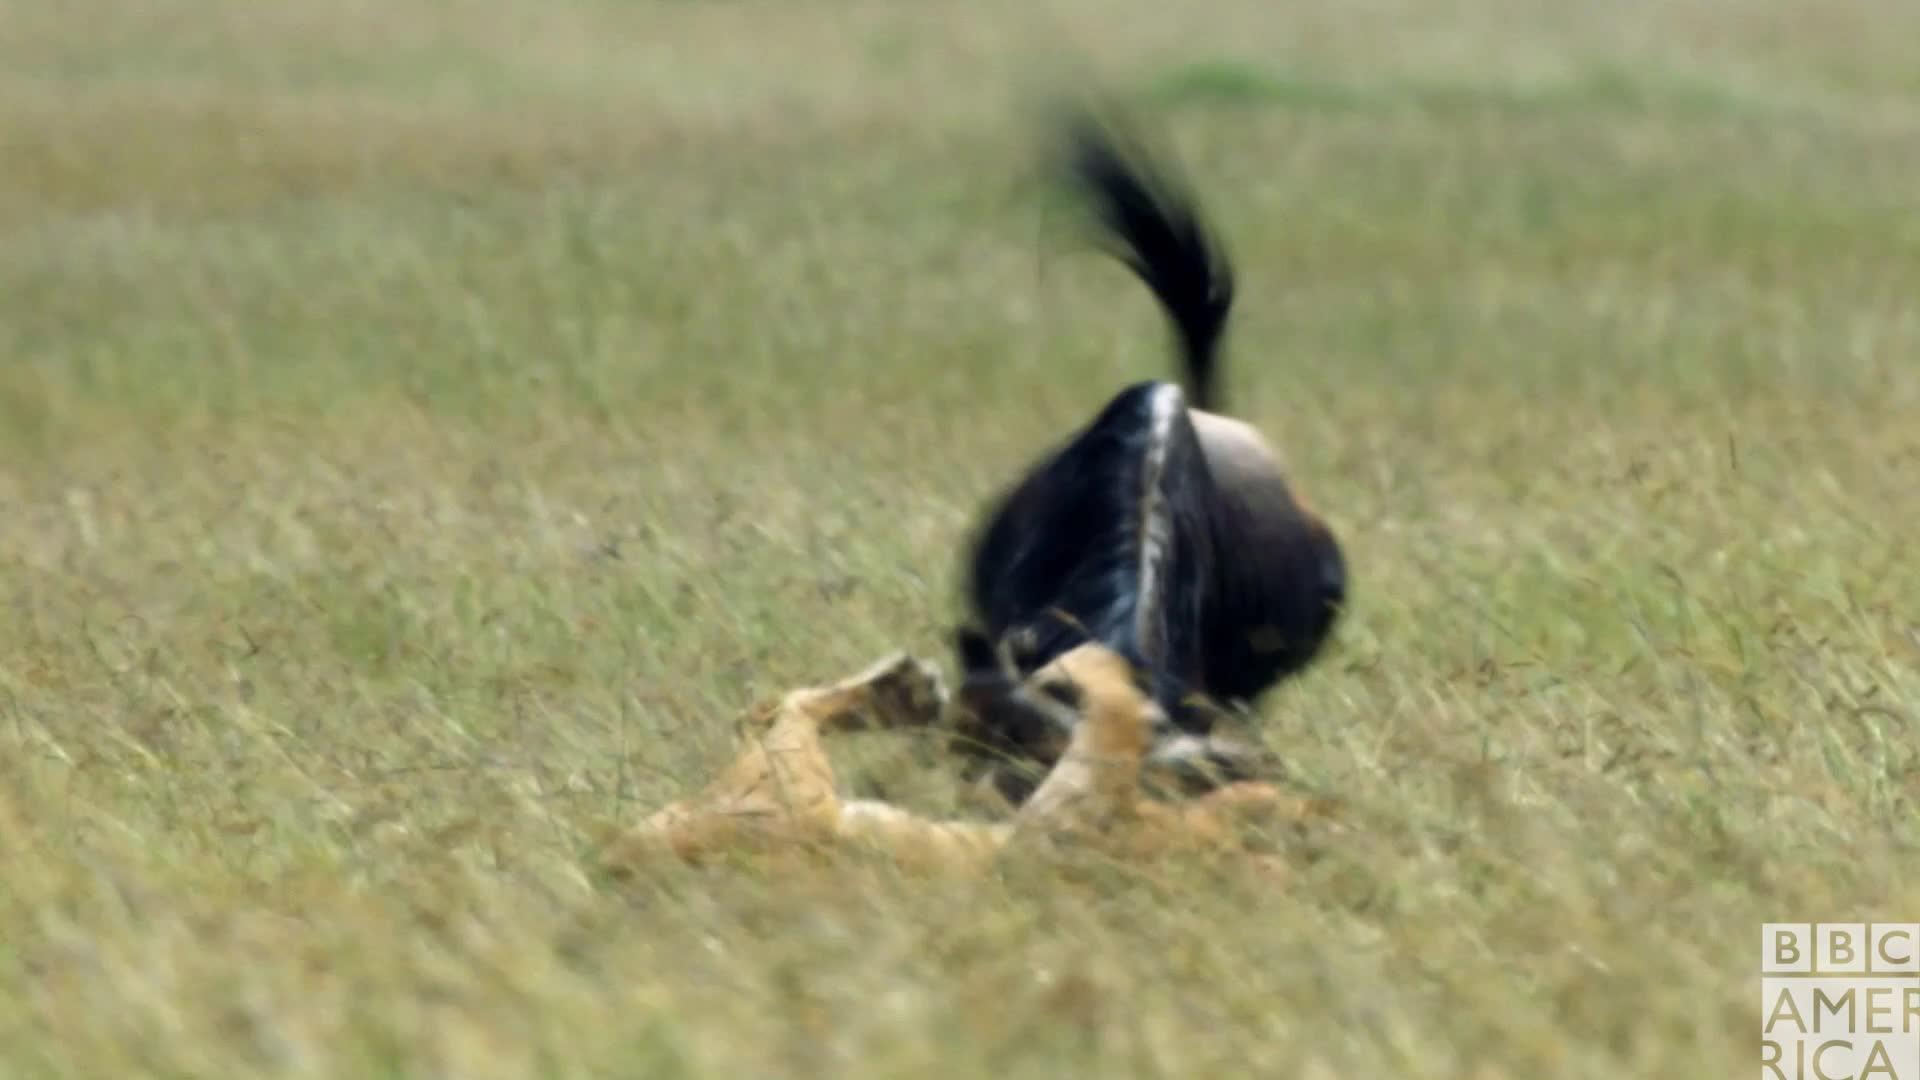 animal, animals, bbc america, bbc america dynasties, bbc america: dynasties, dynasties, fight, hunt, hunting, lion, lions, wildebeest, Dynasties Lioness Charm Hunting Wildebeest GIFs